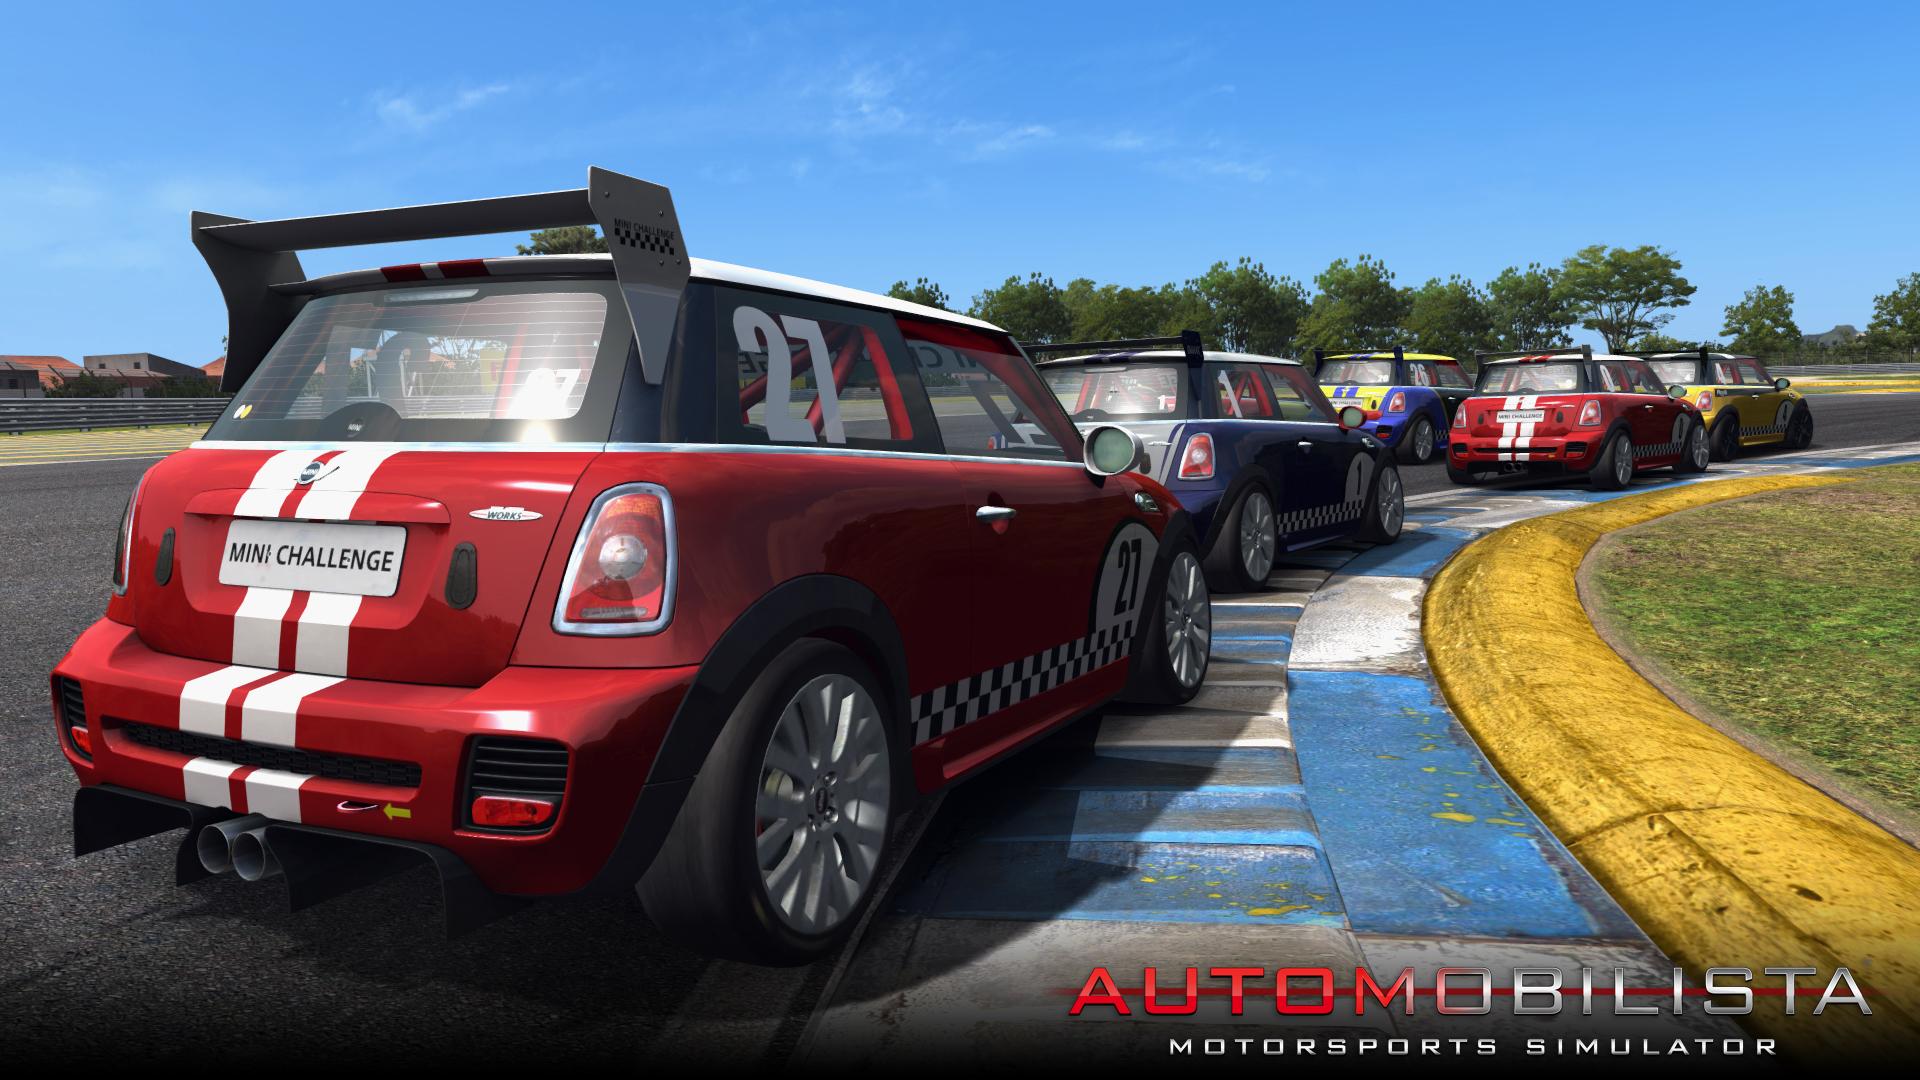 Automobilista - Snetterton (2019) Ultimate Edition